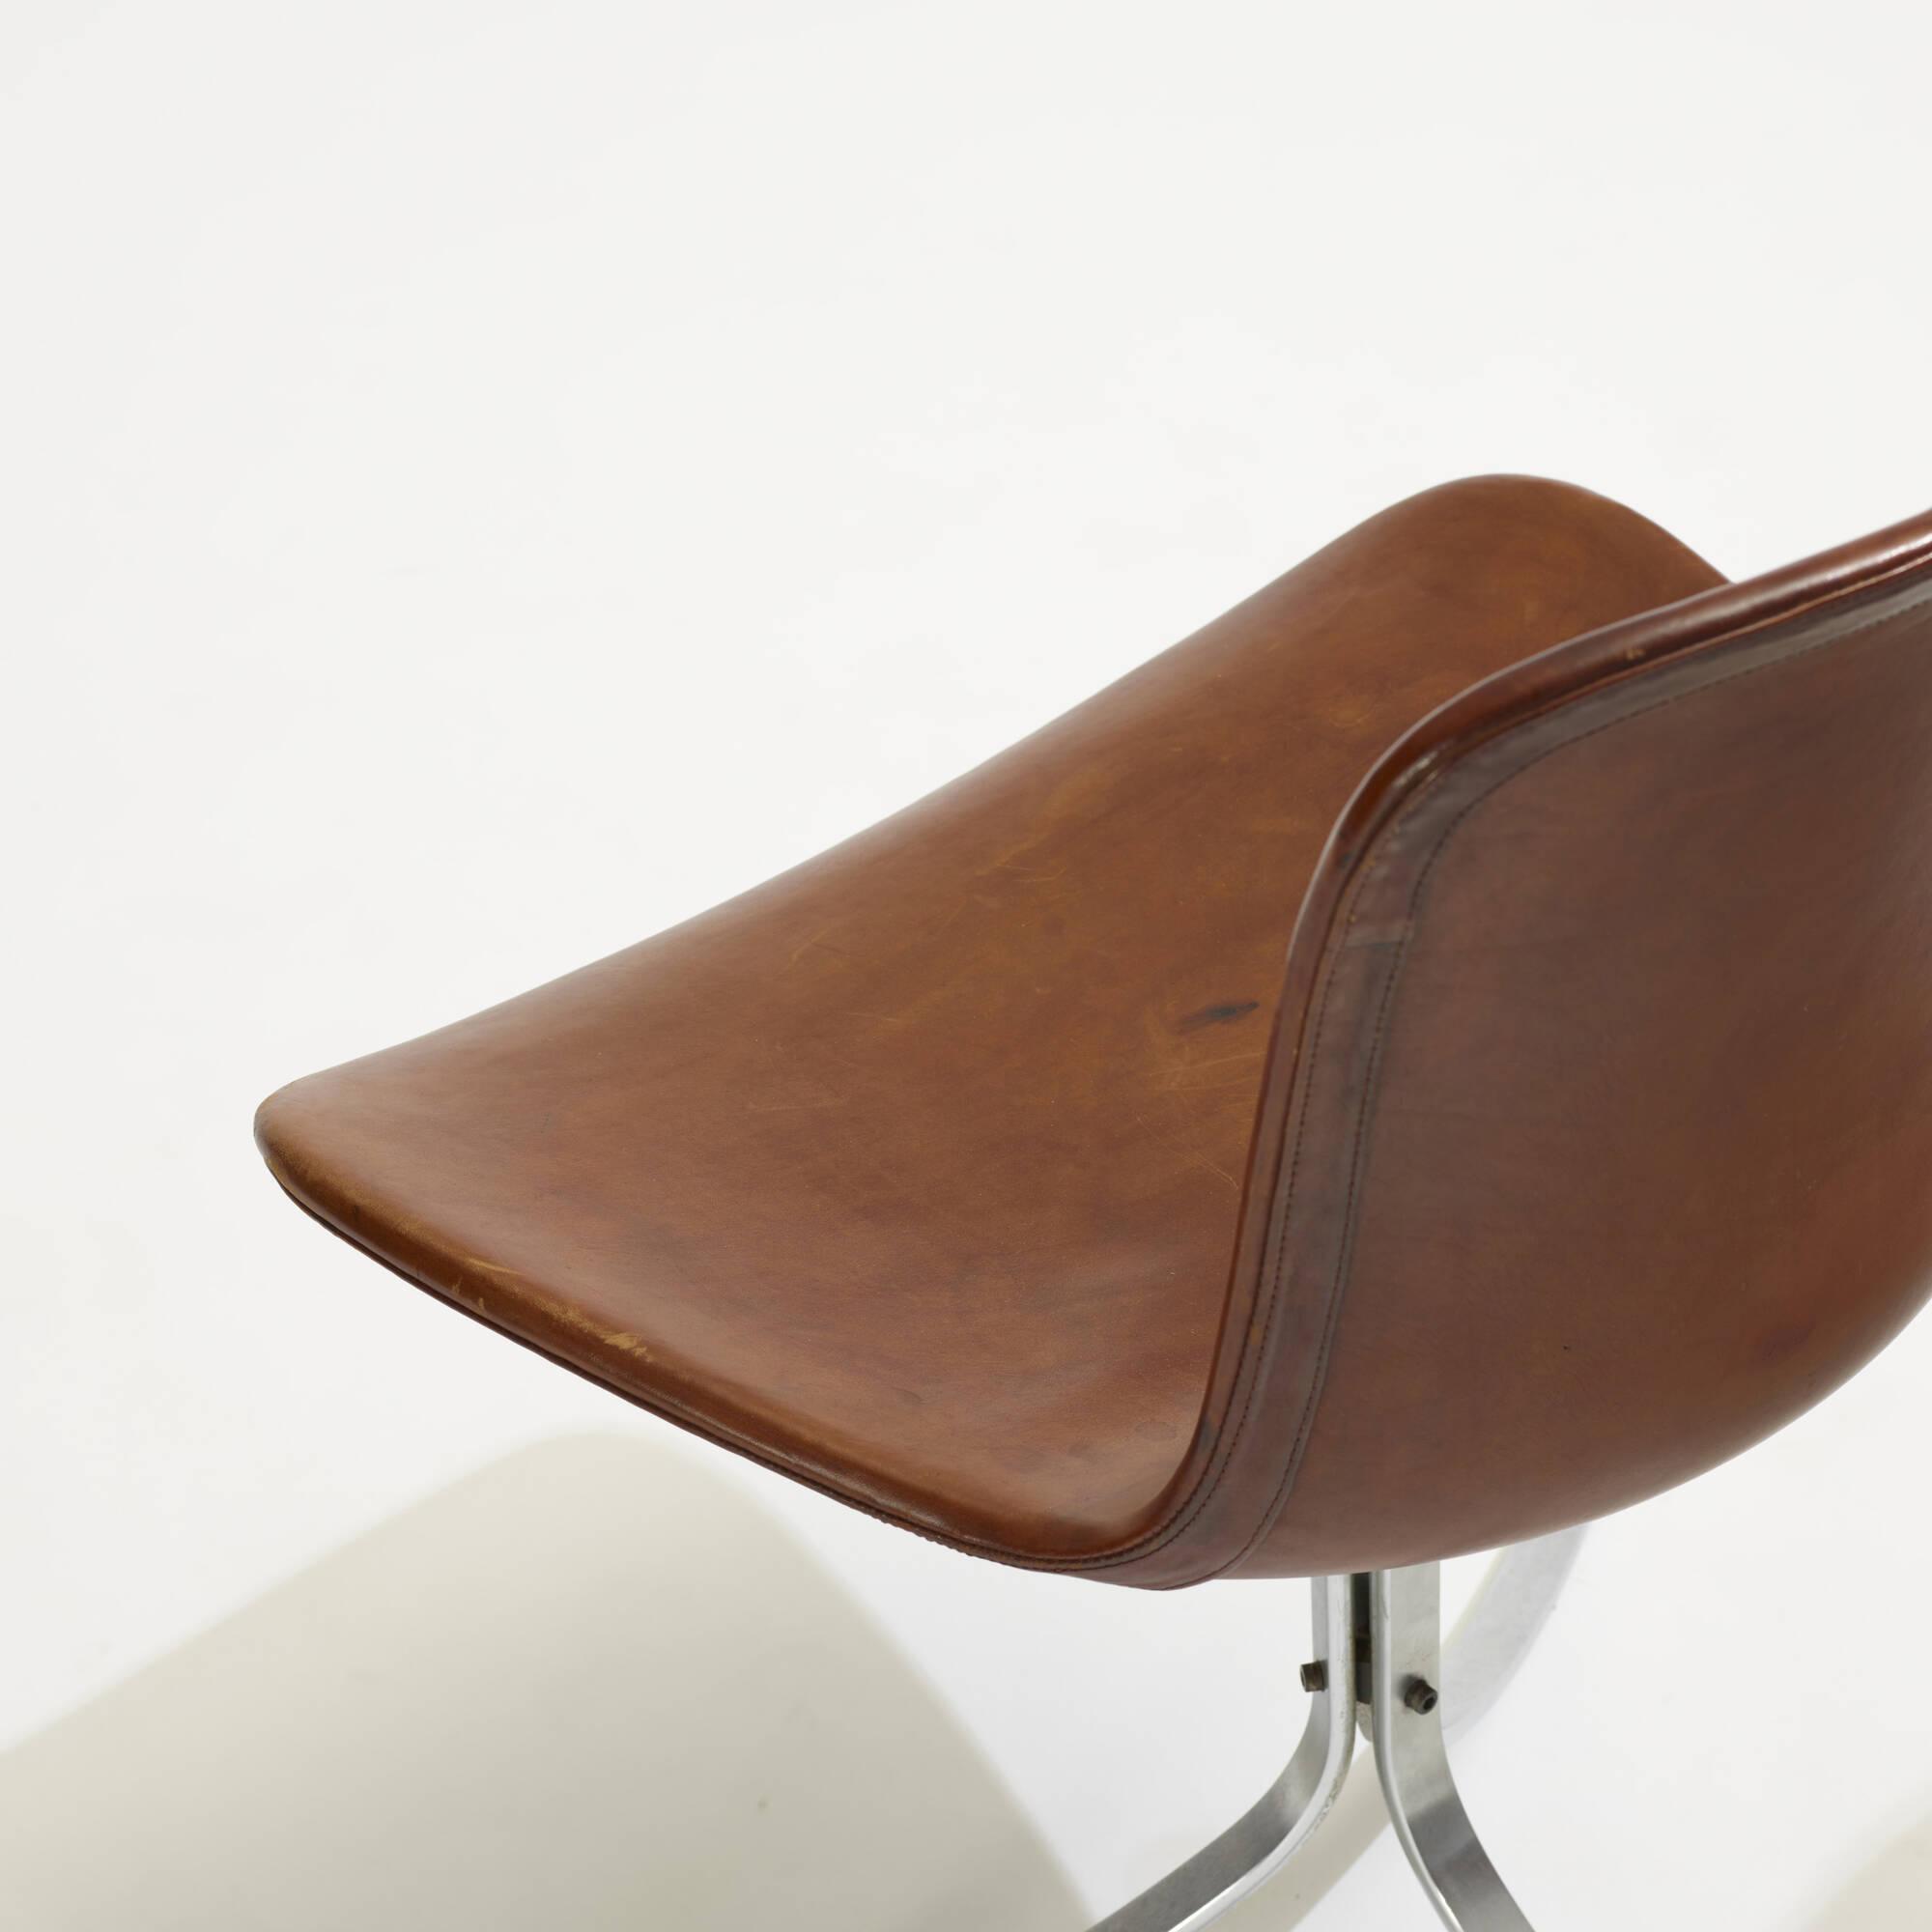 137: Poul Kjaerholm / PK 9 chairs, pair (3 of 3)